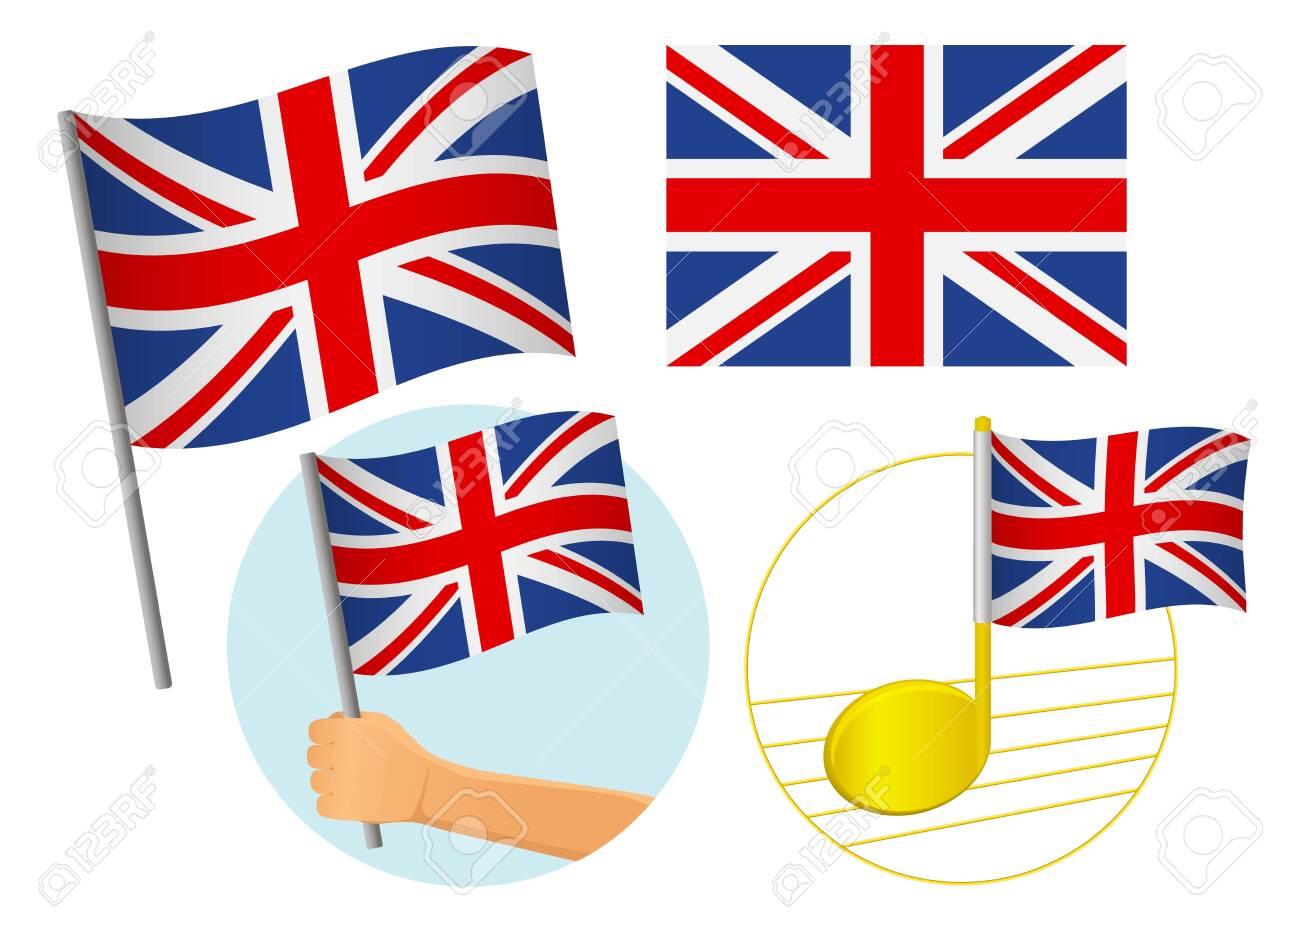 United Kingdom flag icon set. National flag of United Kingdom vector illustration - 131829016